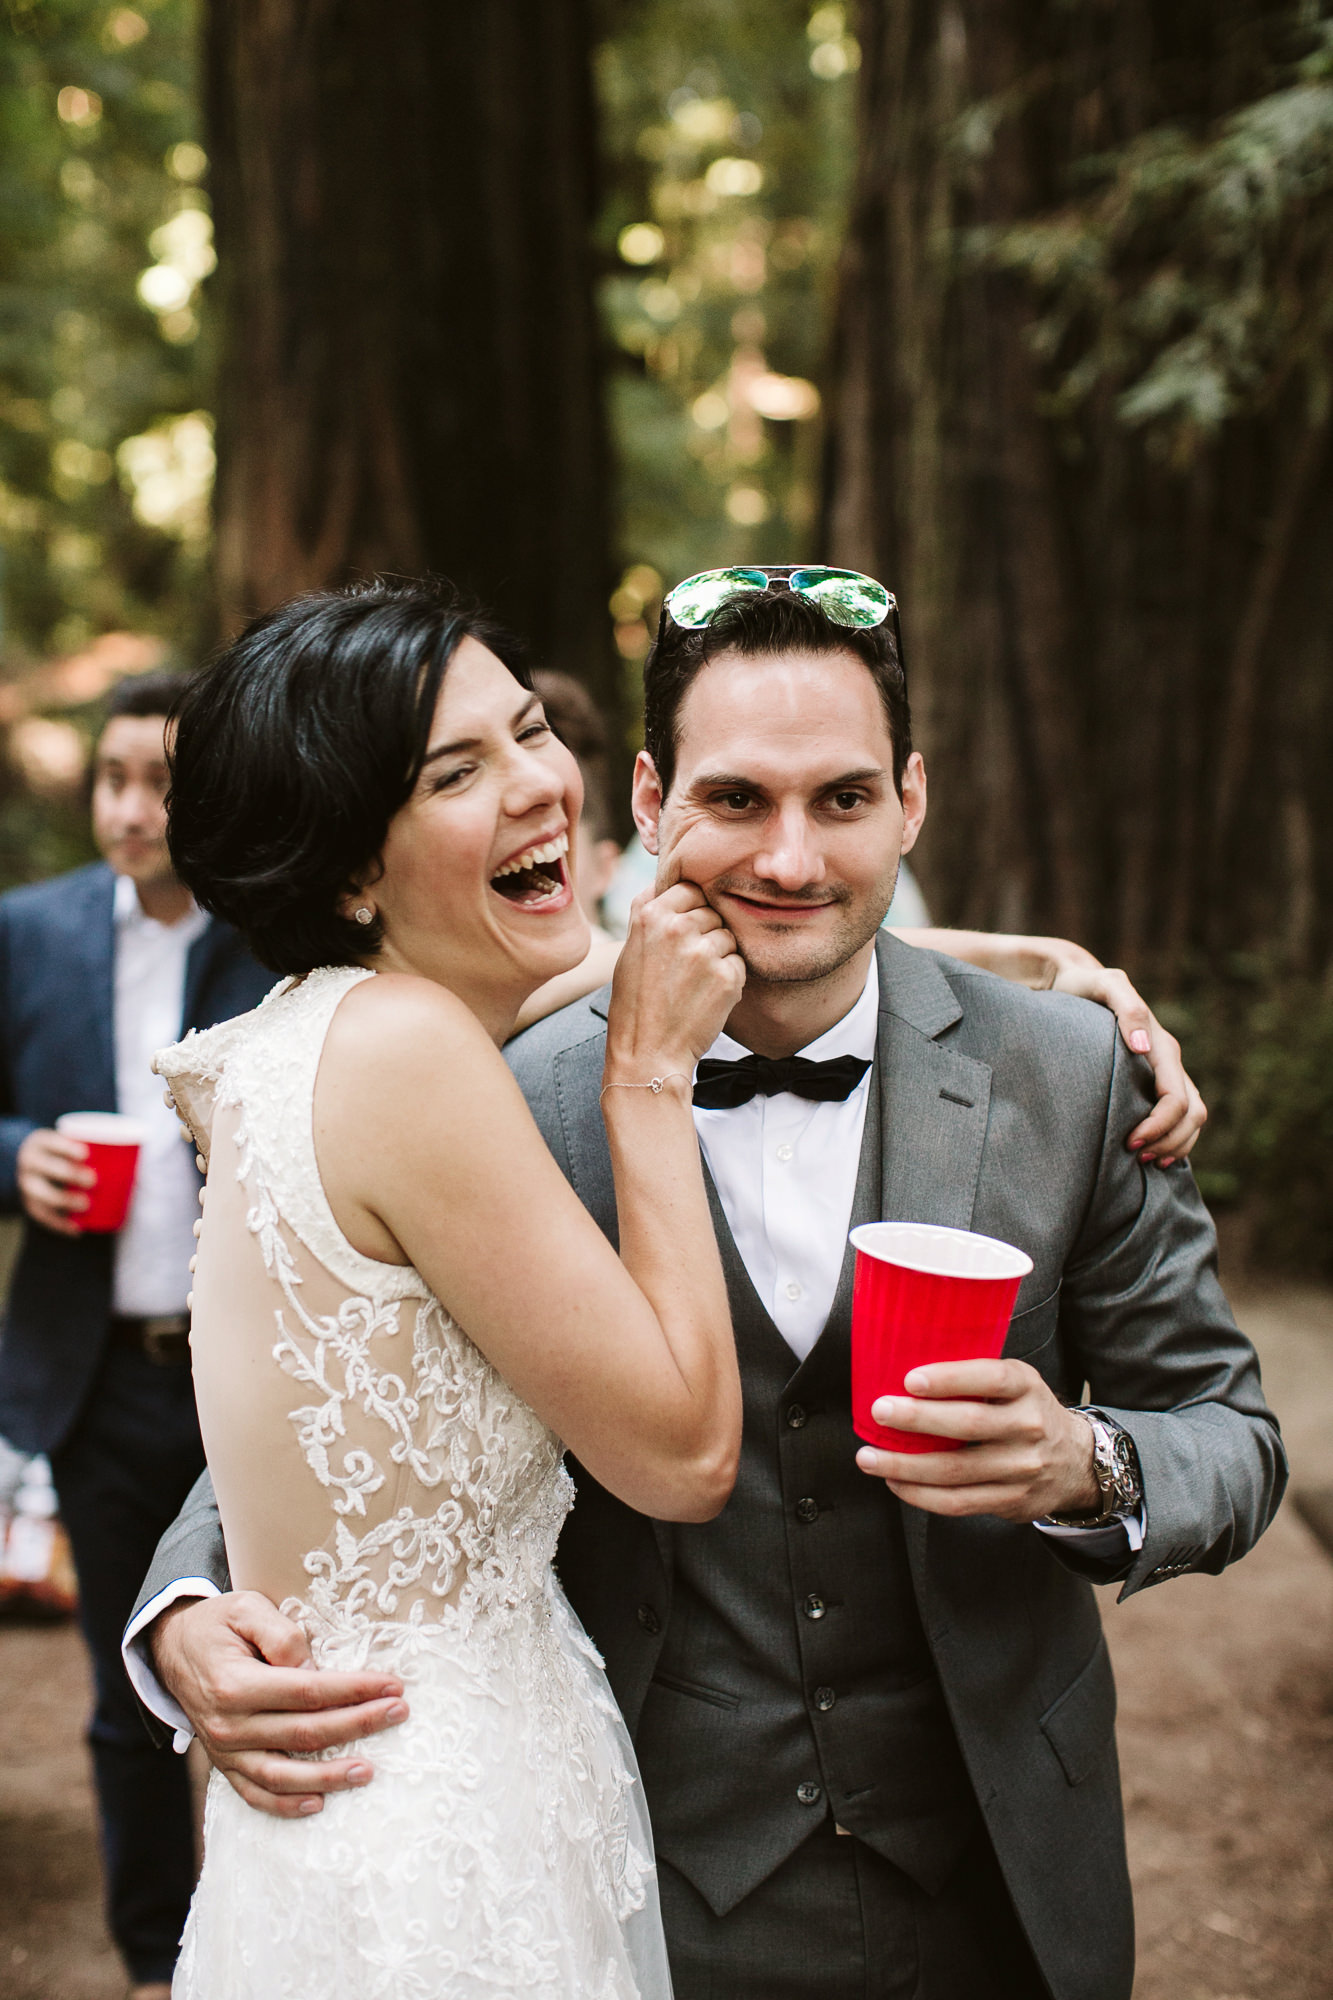 California-wedding-photographer-alfonso-flores-pamplin-groove-294.jpg